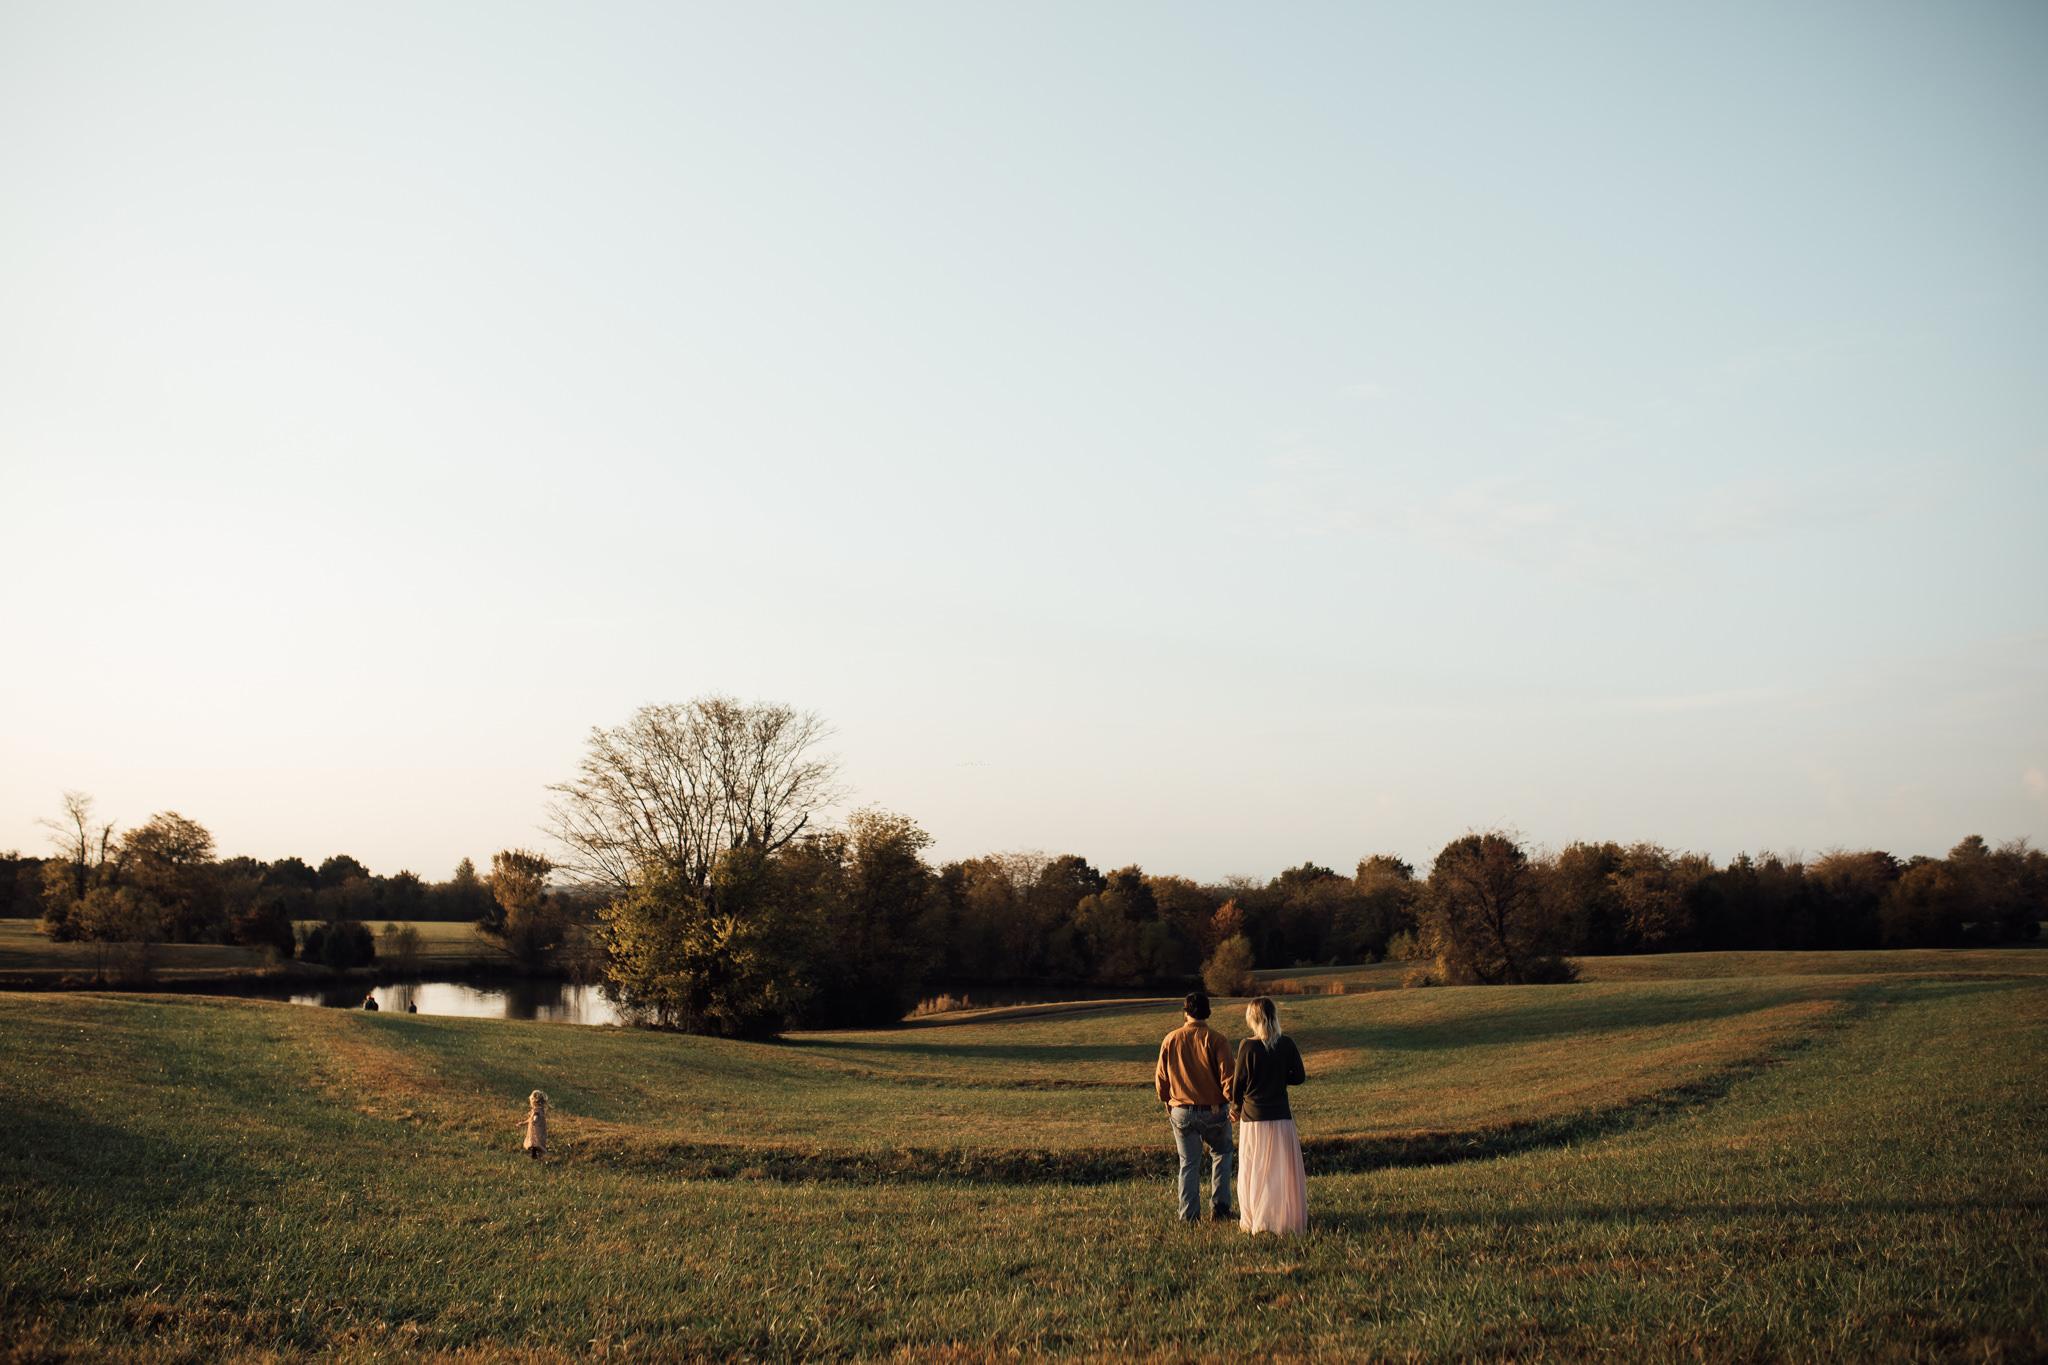 cassie-cook-photography-memphis-family-photographer-lifestyle-family-photographer-sunrise-gray-family-57.jpg